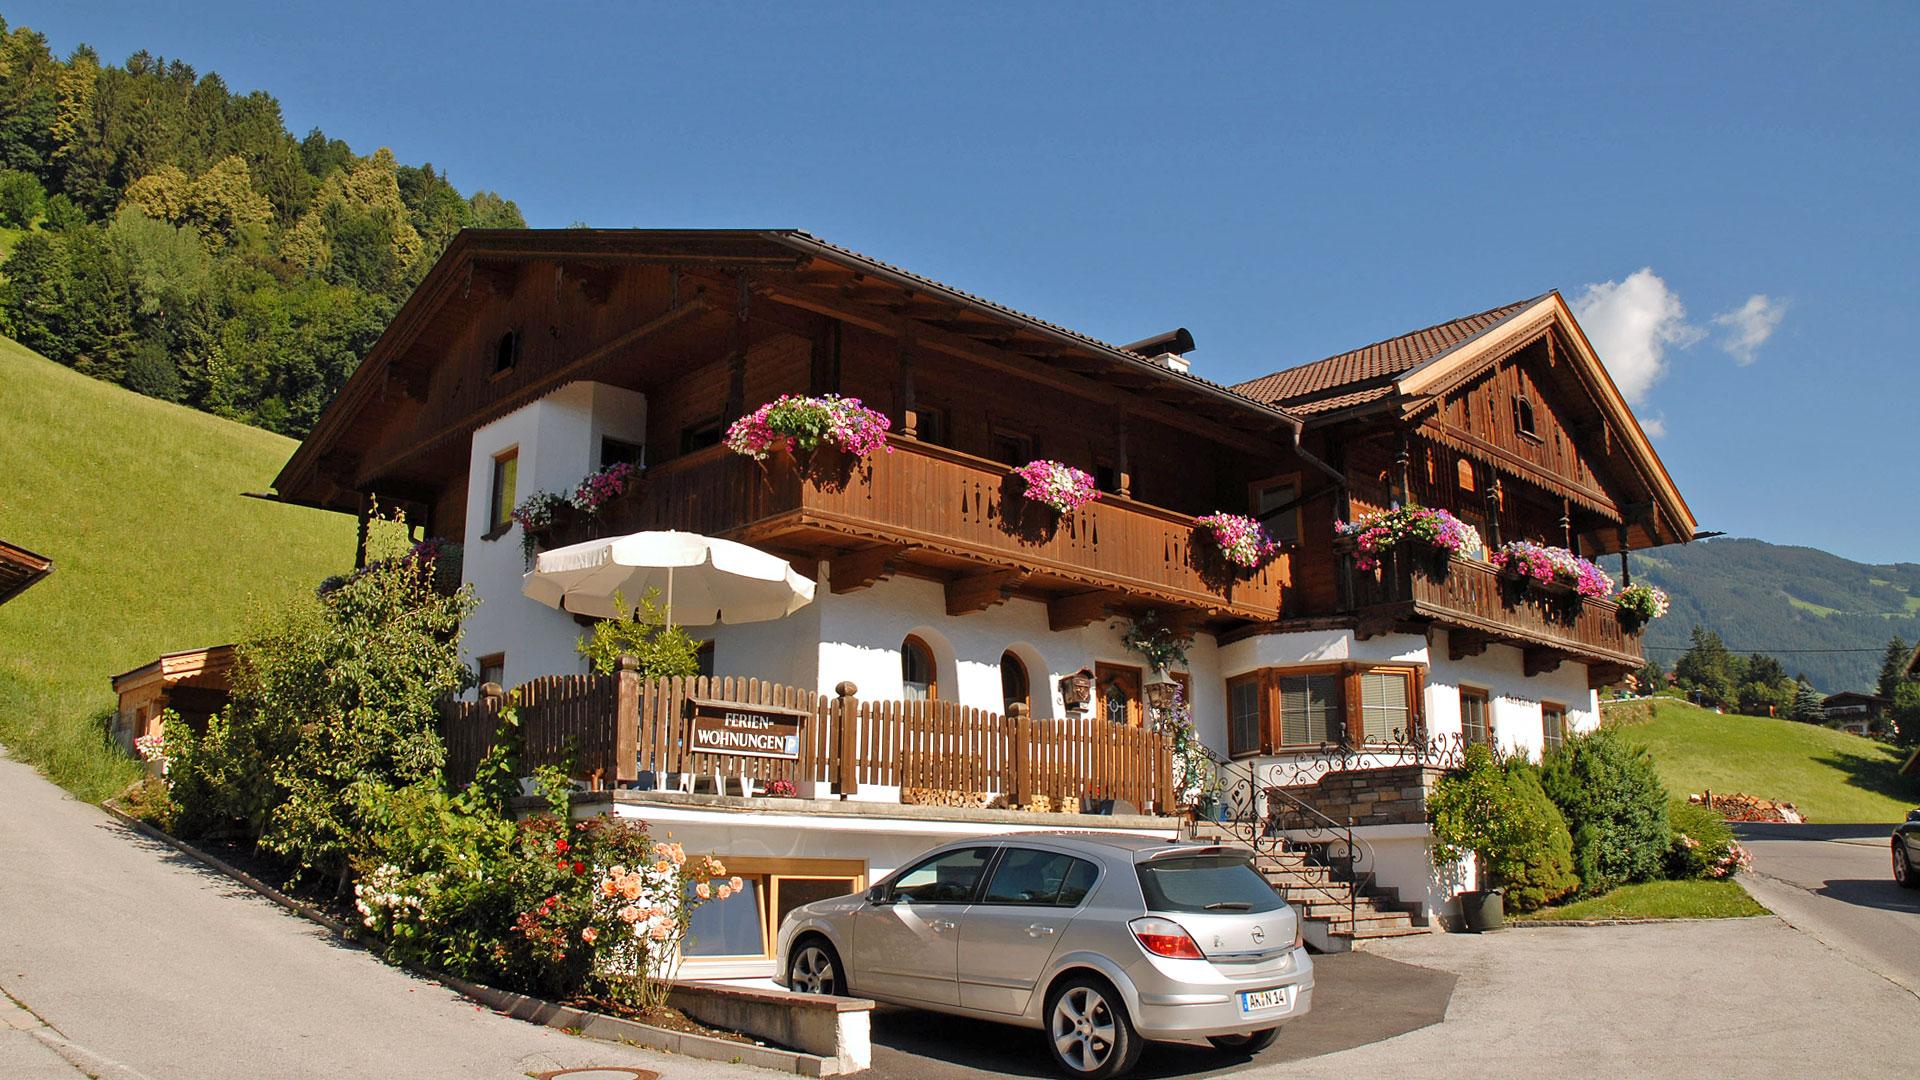 Ferienhaus Kashütte Hippach im Zillertal